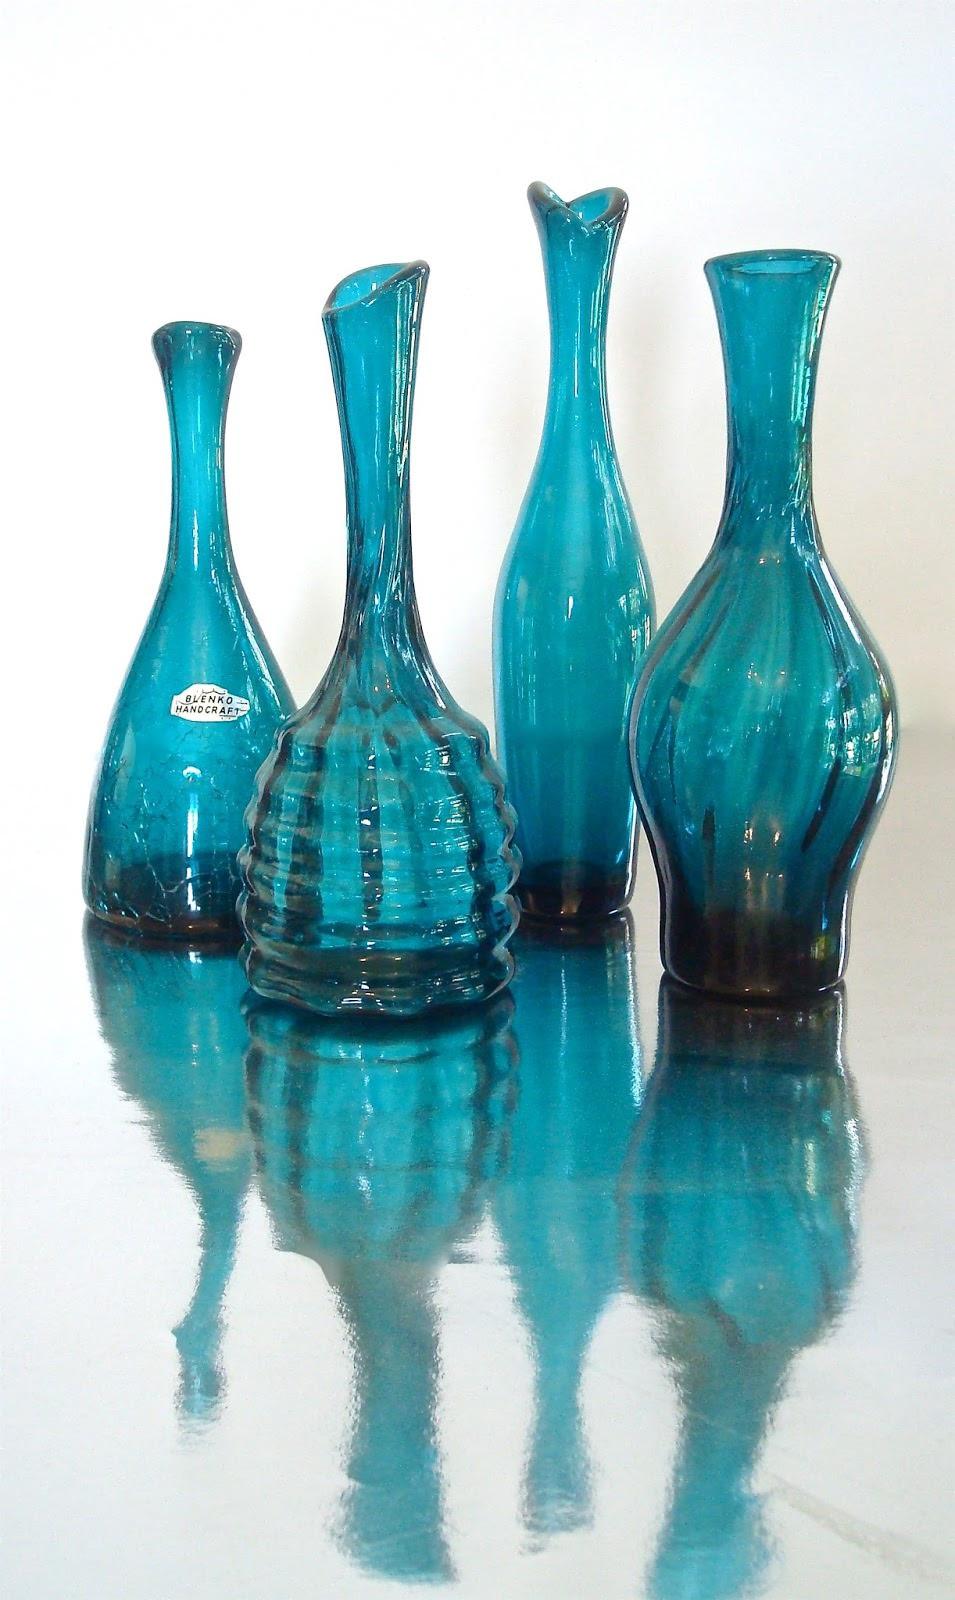 23 Lovable Blenko Handcraft Vase 2021 free download blenko handcraft vase of blenko glass gallery mcm daily throughout blenko colorful galssware carafe lamps vowls artglass